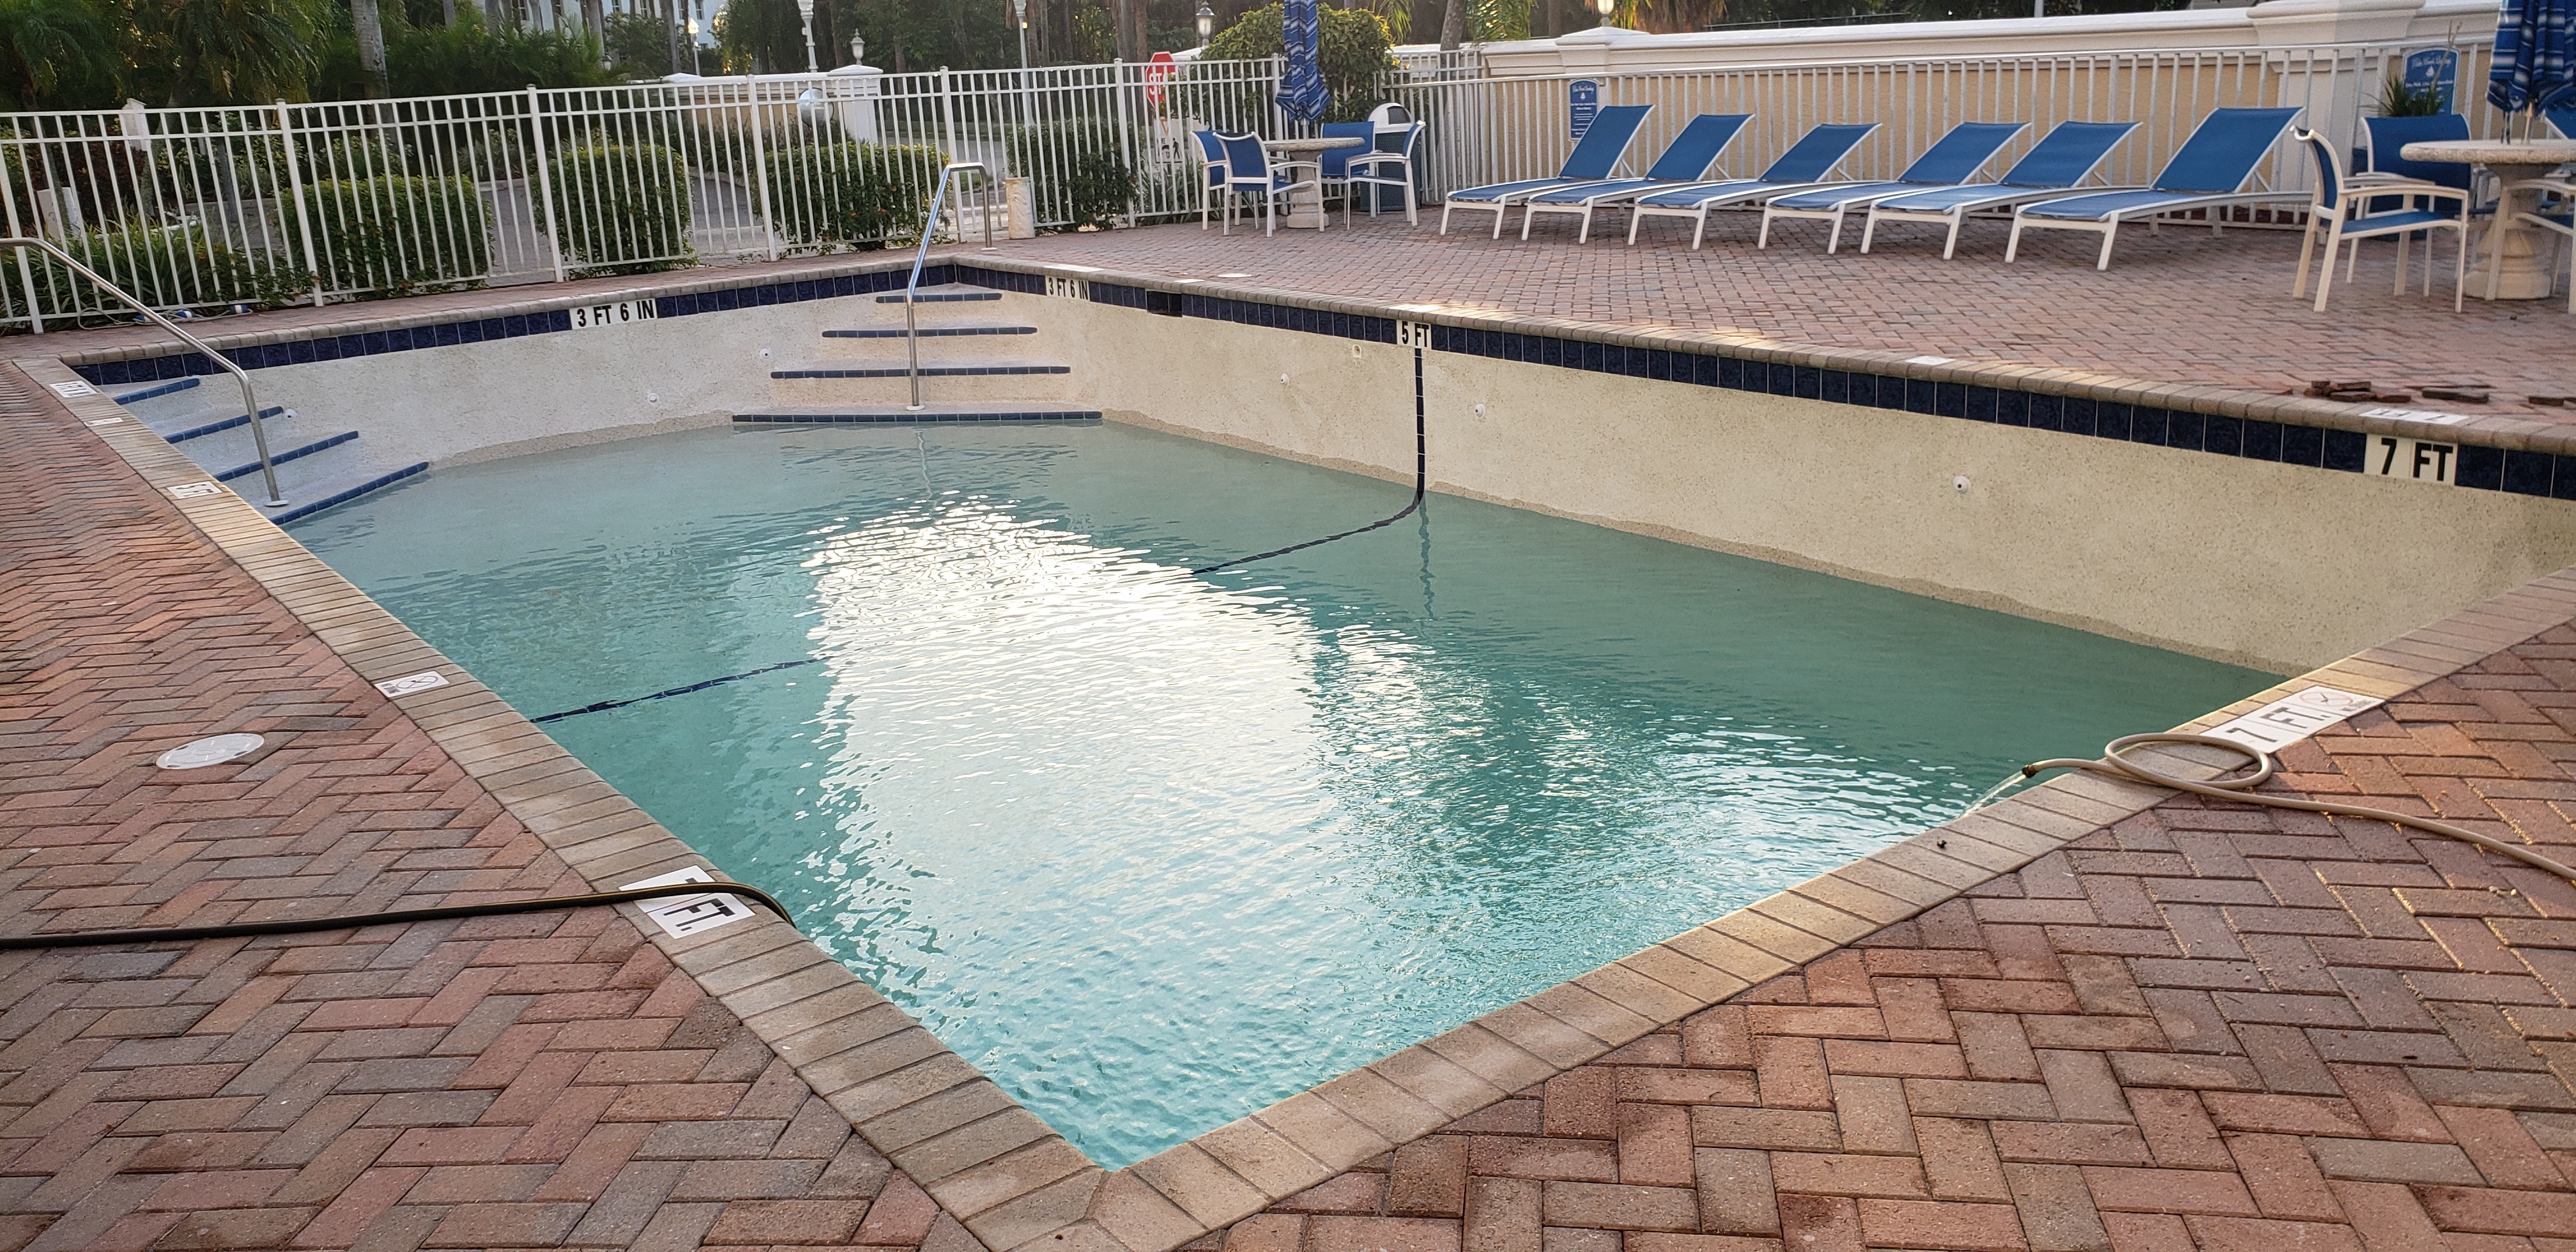 2019-07-26 Pool Resurfacing (4)